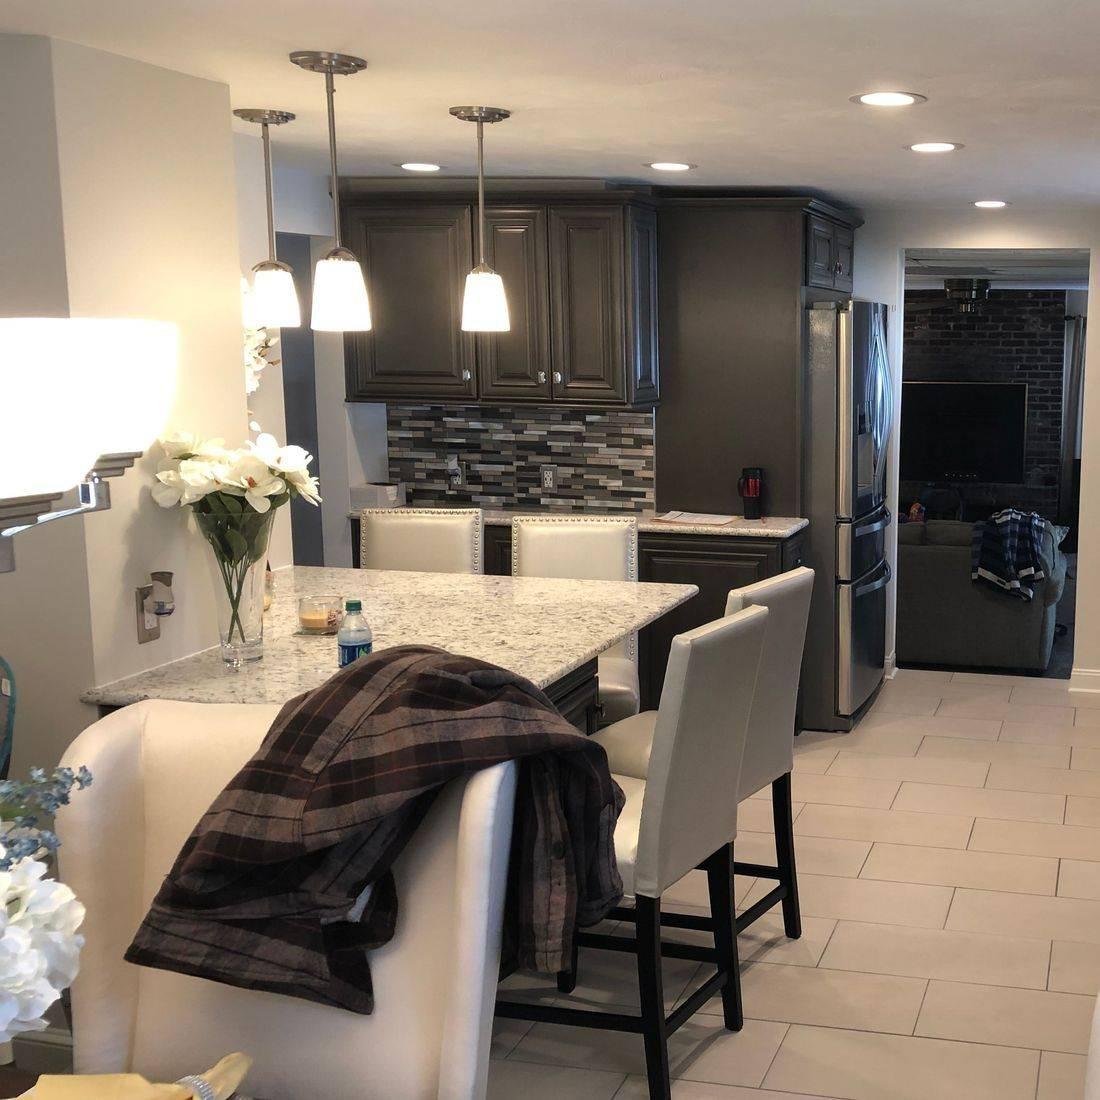 Total Kitchen Renovation/ After